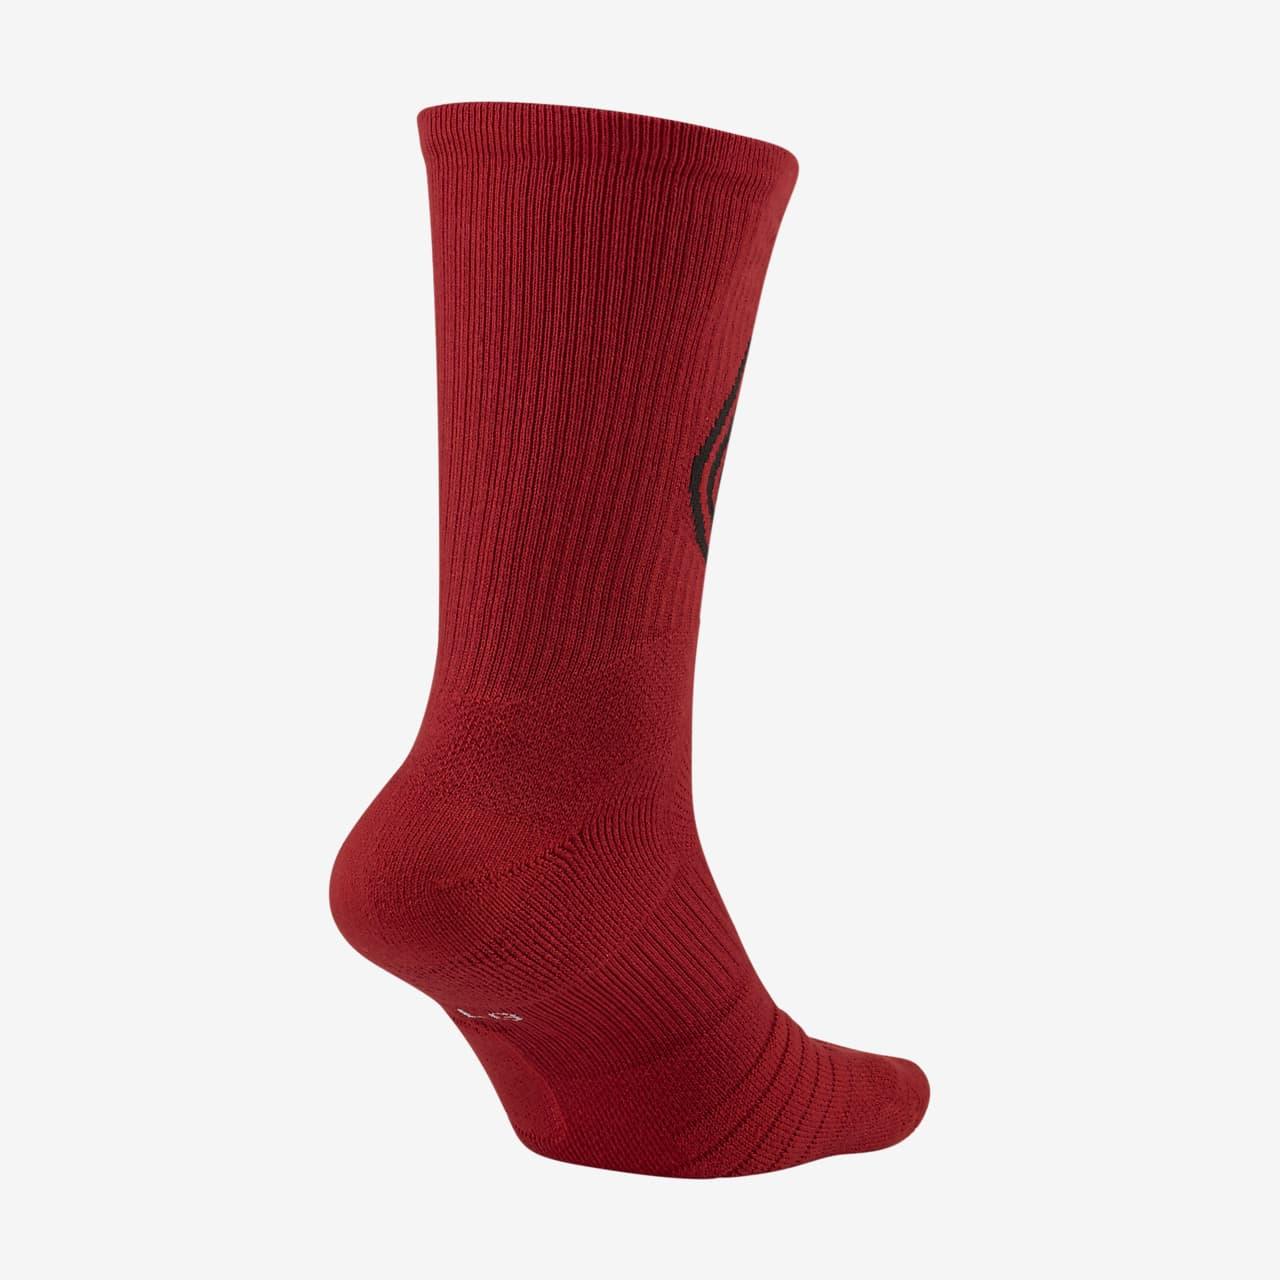 Portland Trail Blazers Elite Nike NBA Crew Socks SK0182-657